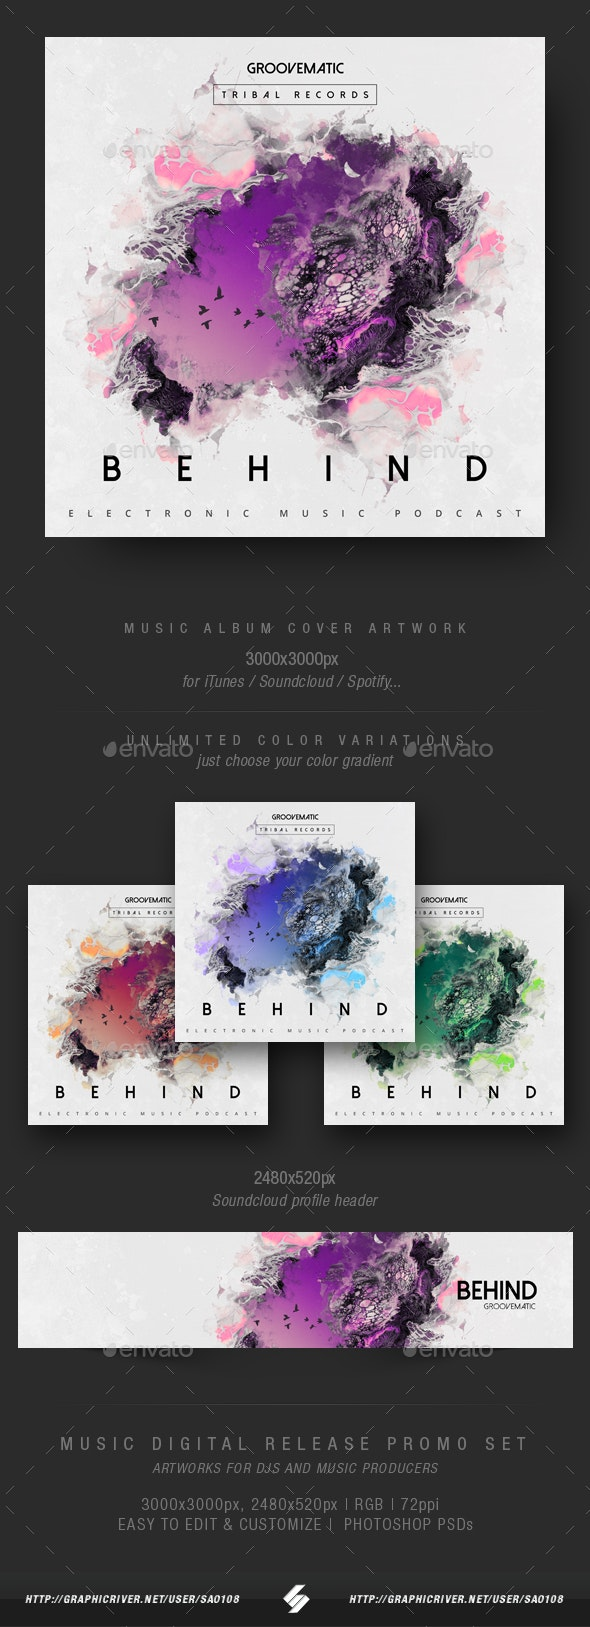 Behind - Music Album Cover Artwork Template - Miscellaneous Social Media